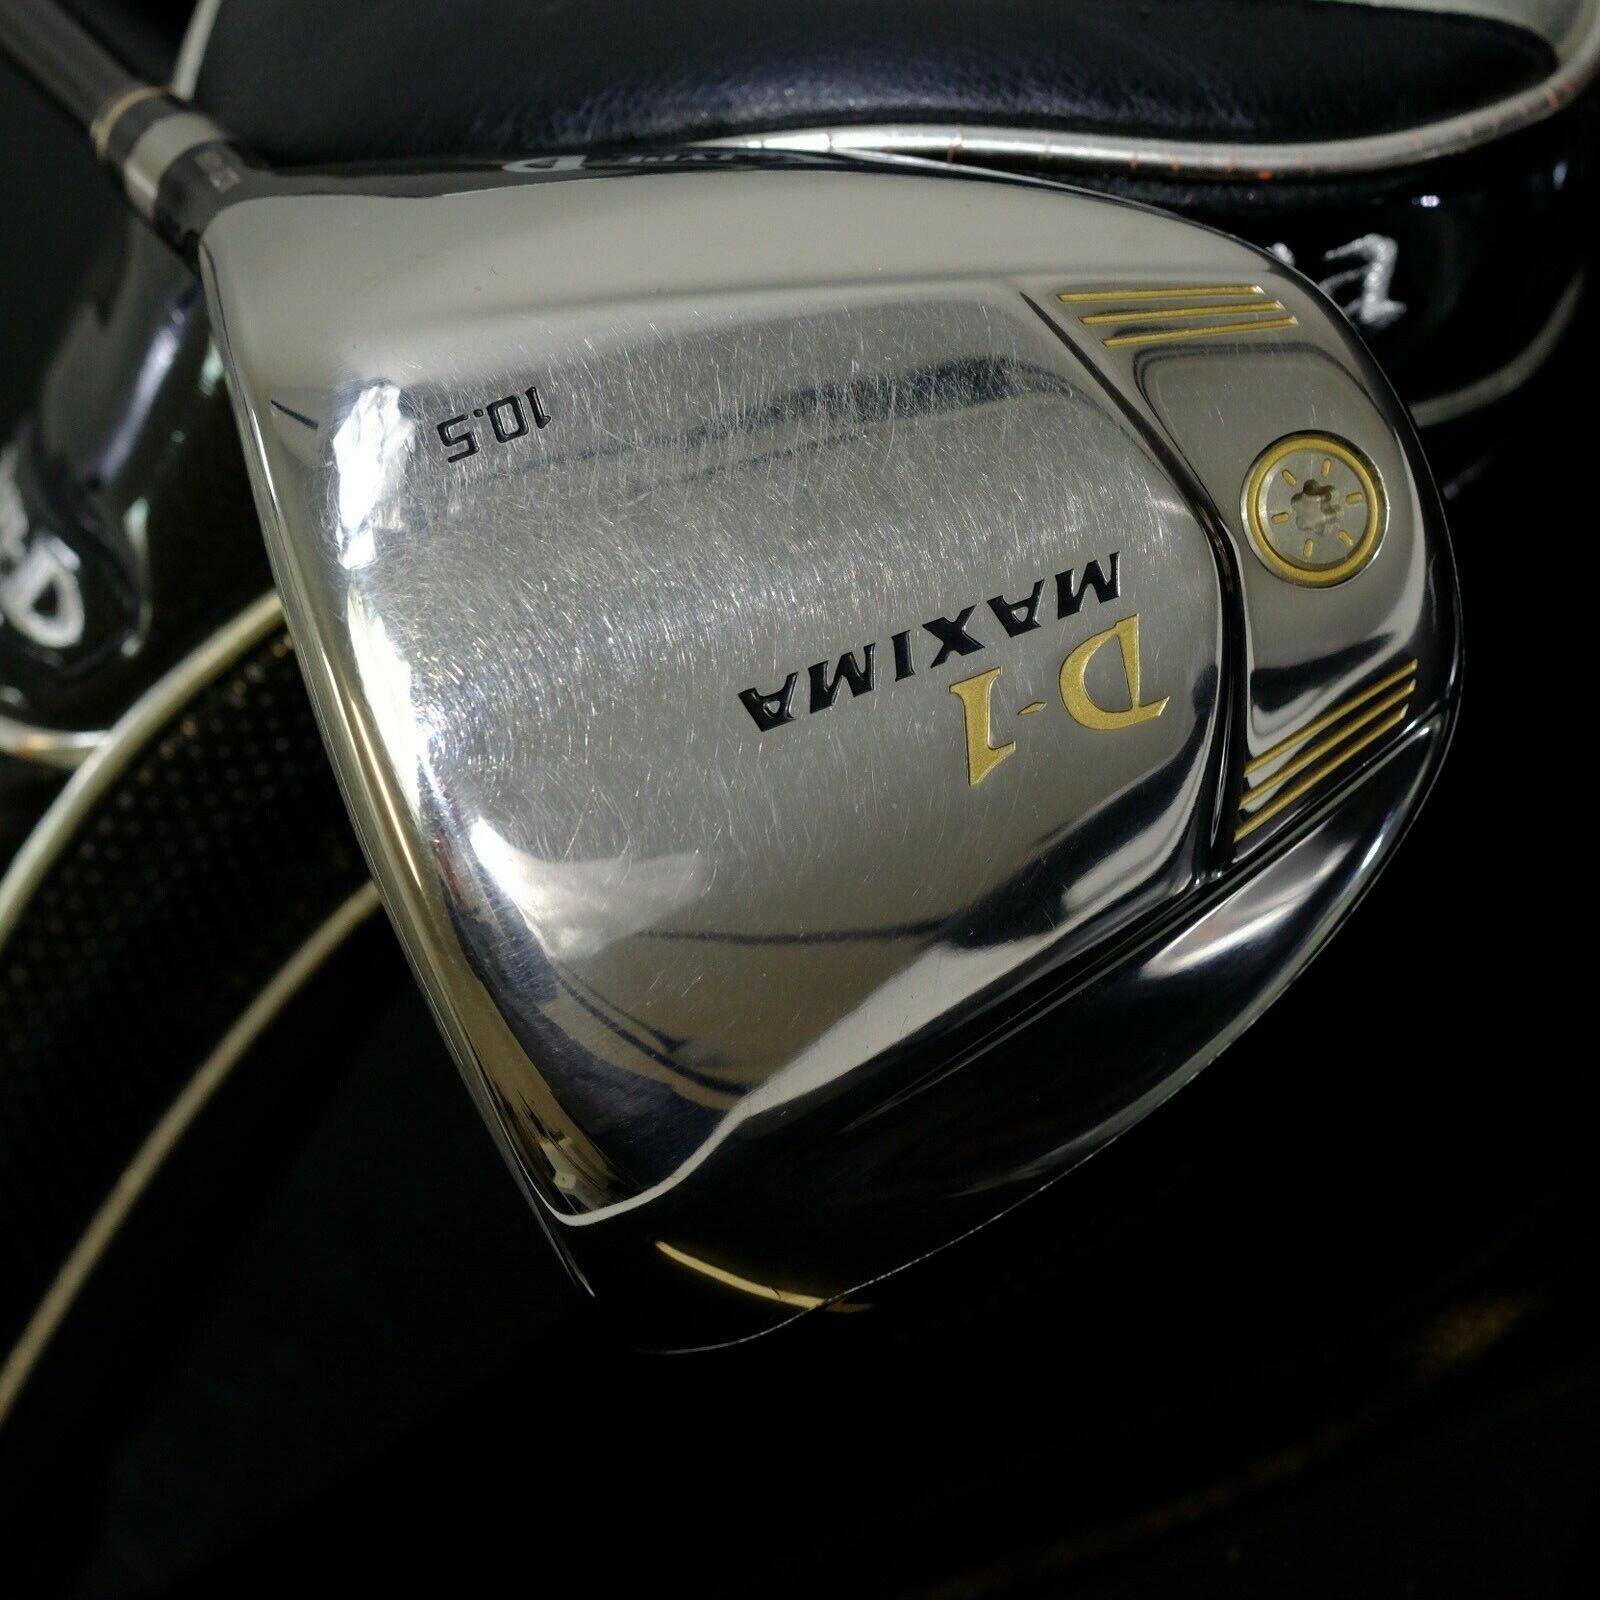 Ryoma D-1 Maxima Tipo-D (10.5) gira Ad MX-D (R)  580905000 Driver